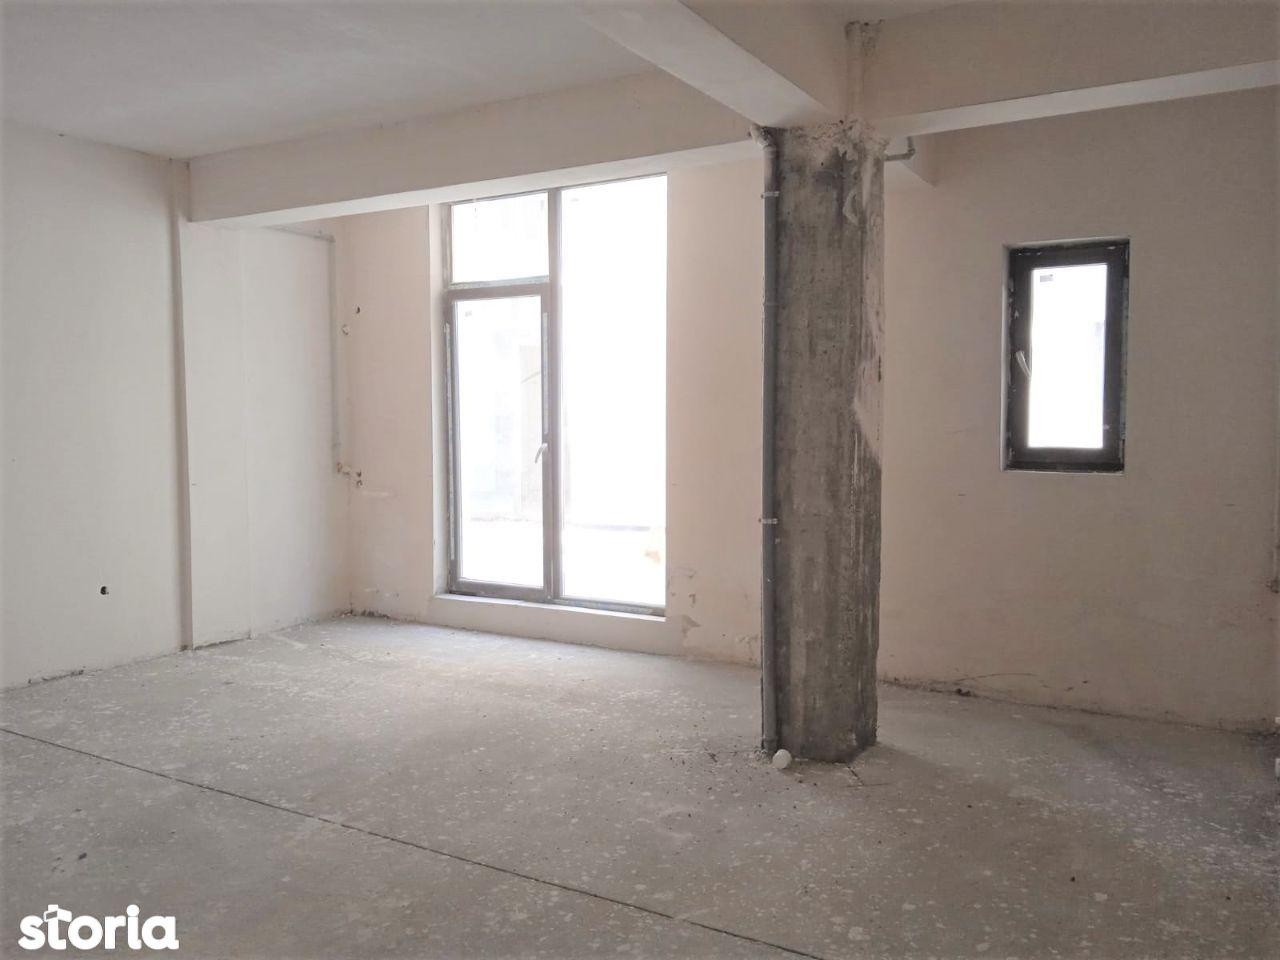 51 000 euro | Apartament 2 camere 91 mp cu terasa | Piata Rahovei |